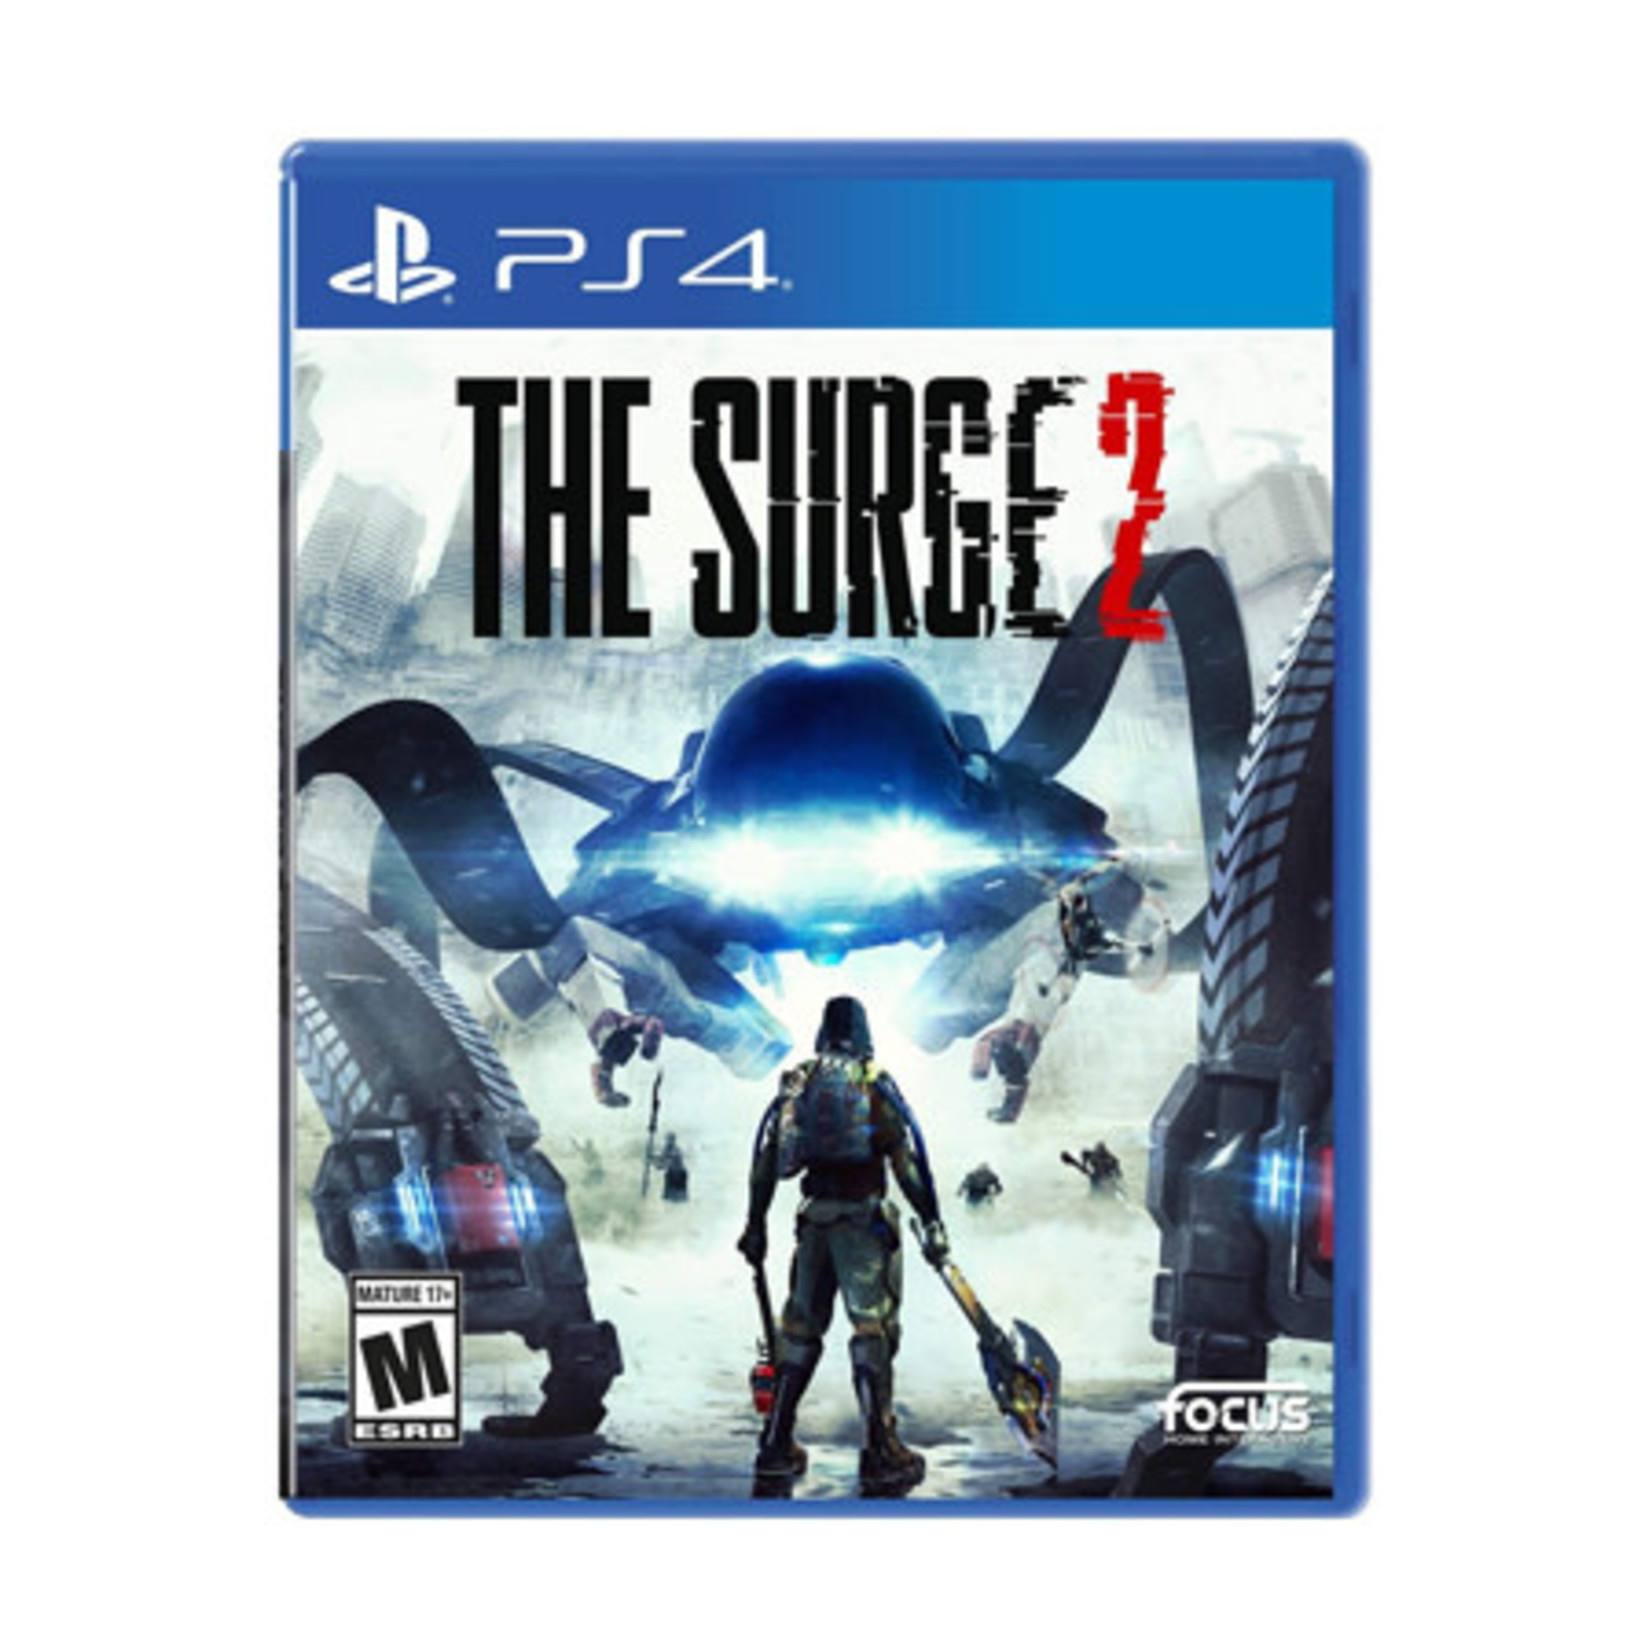 PS4U-The Surge 2